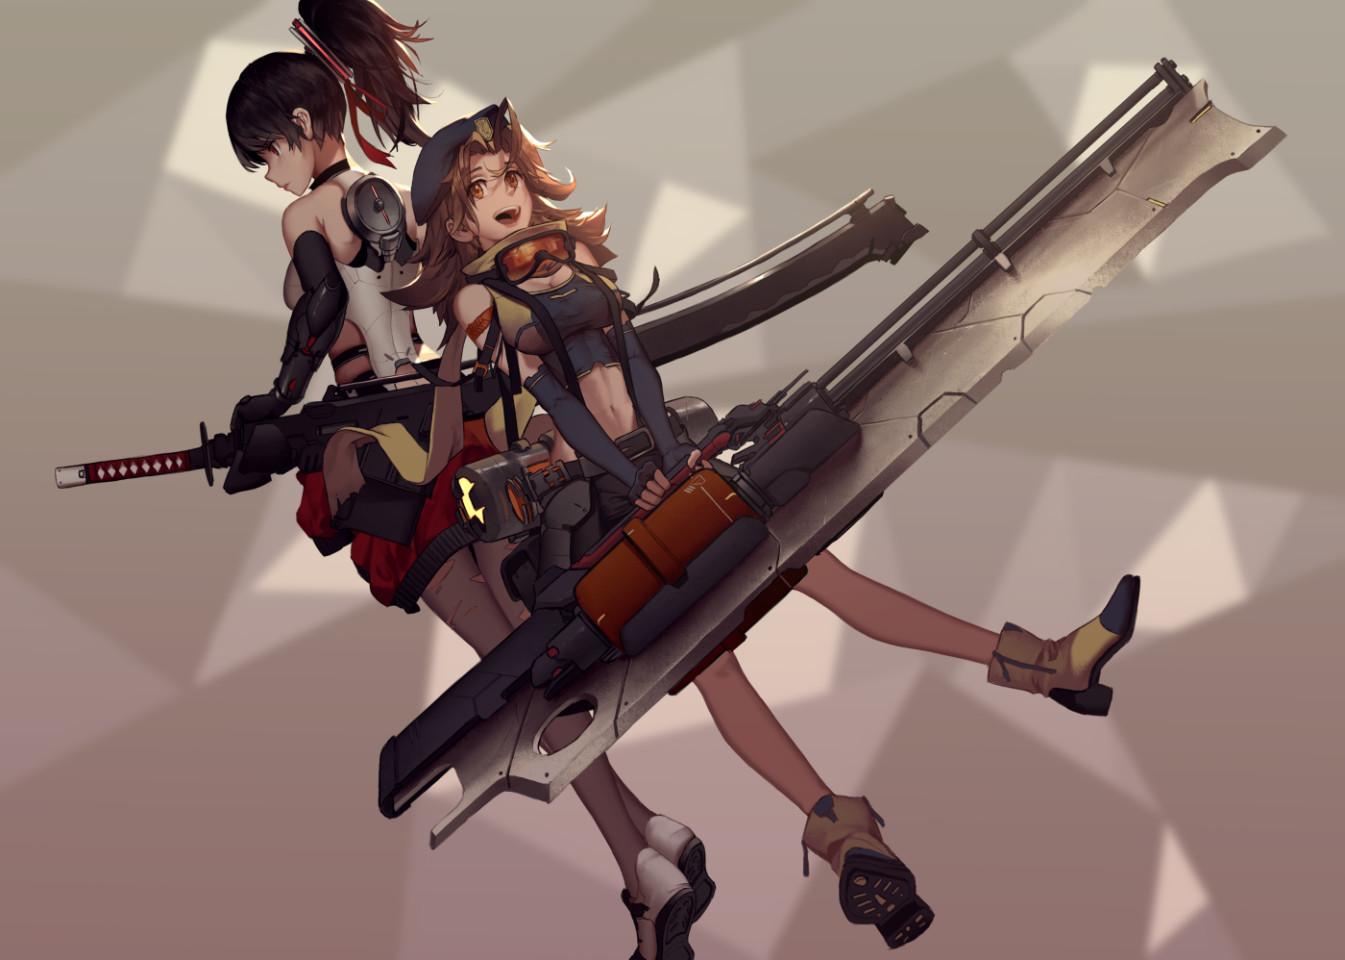 Combat girls concept